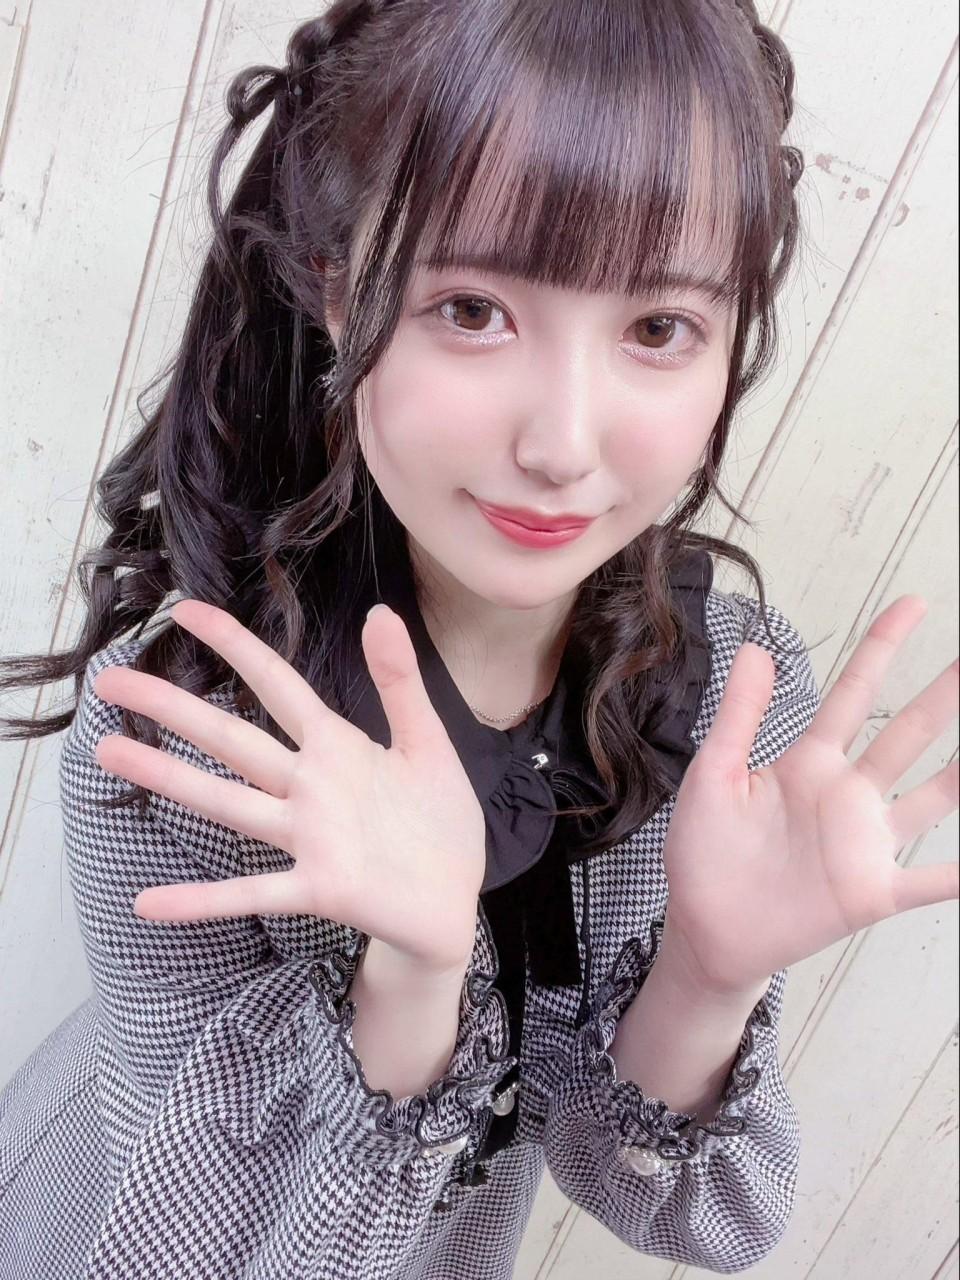 SOD史上年龄最小的女演员:朝田ひまり 2002年出生